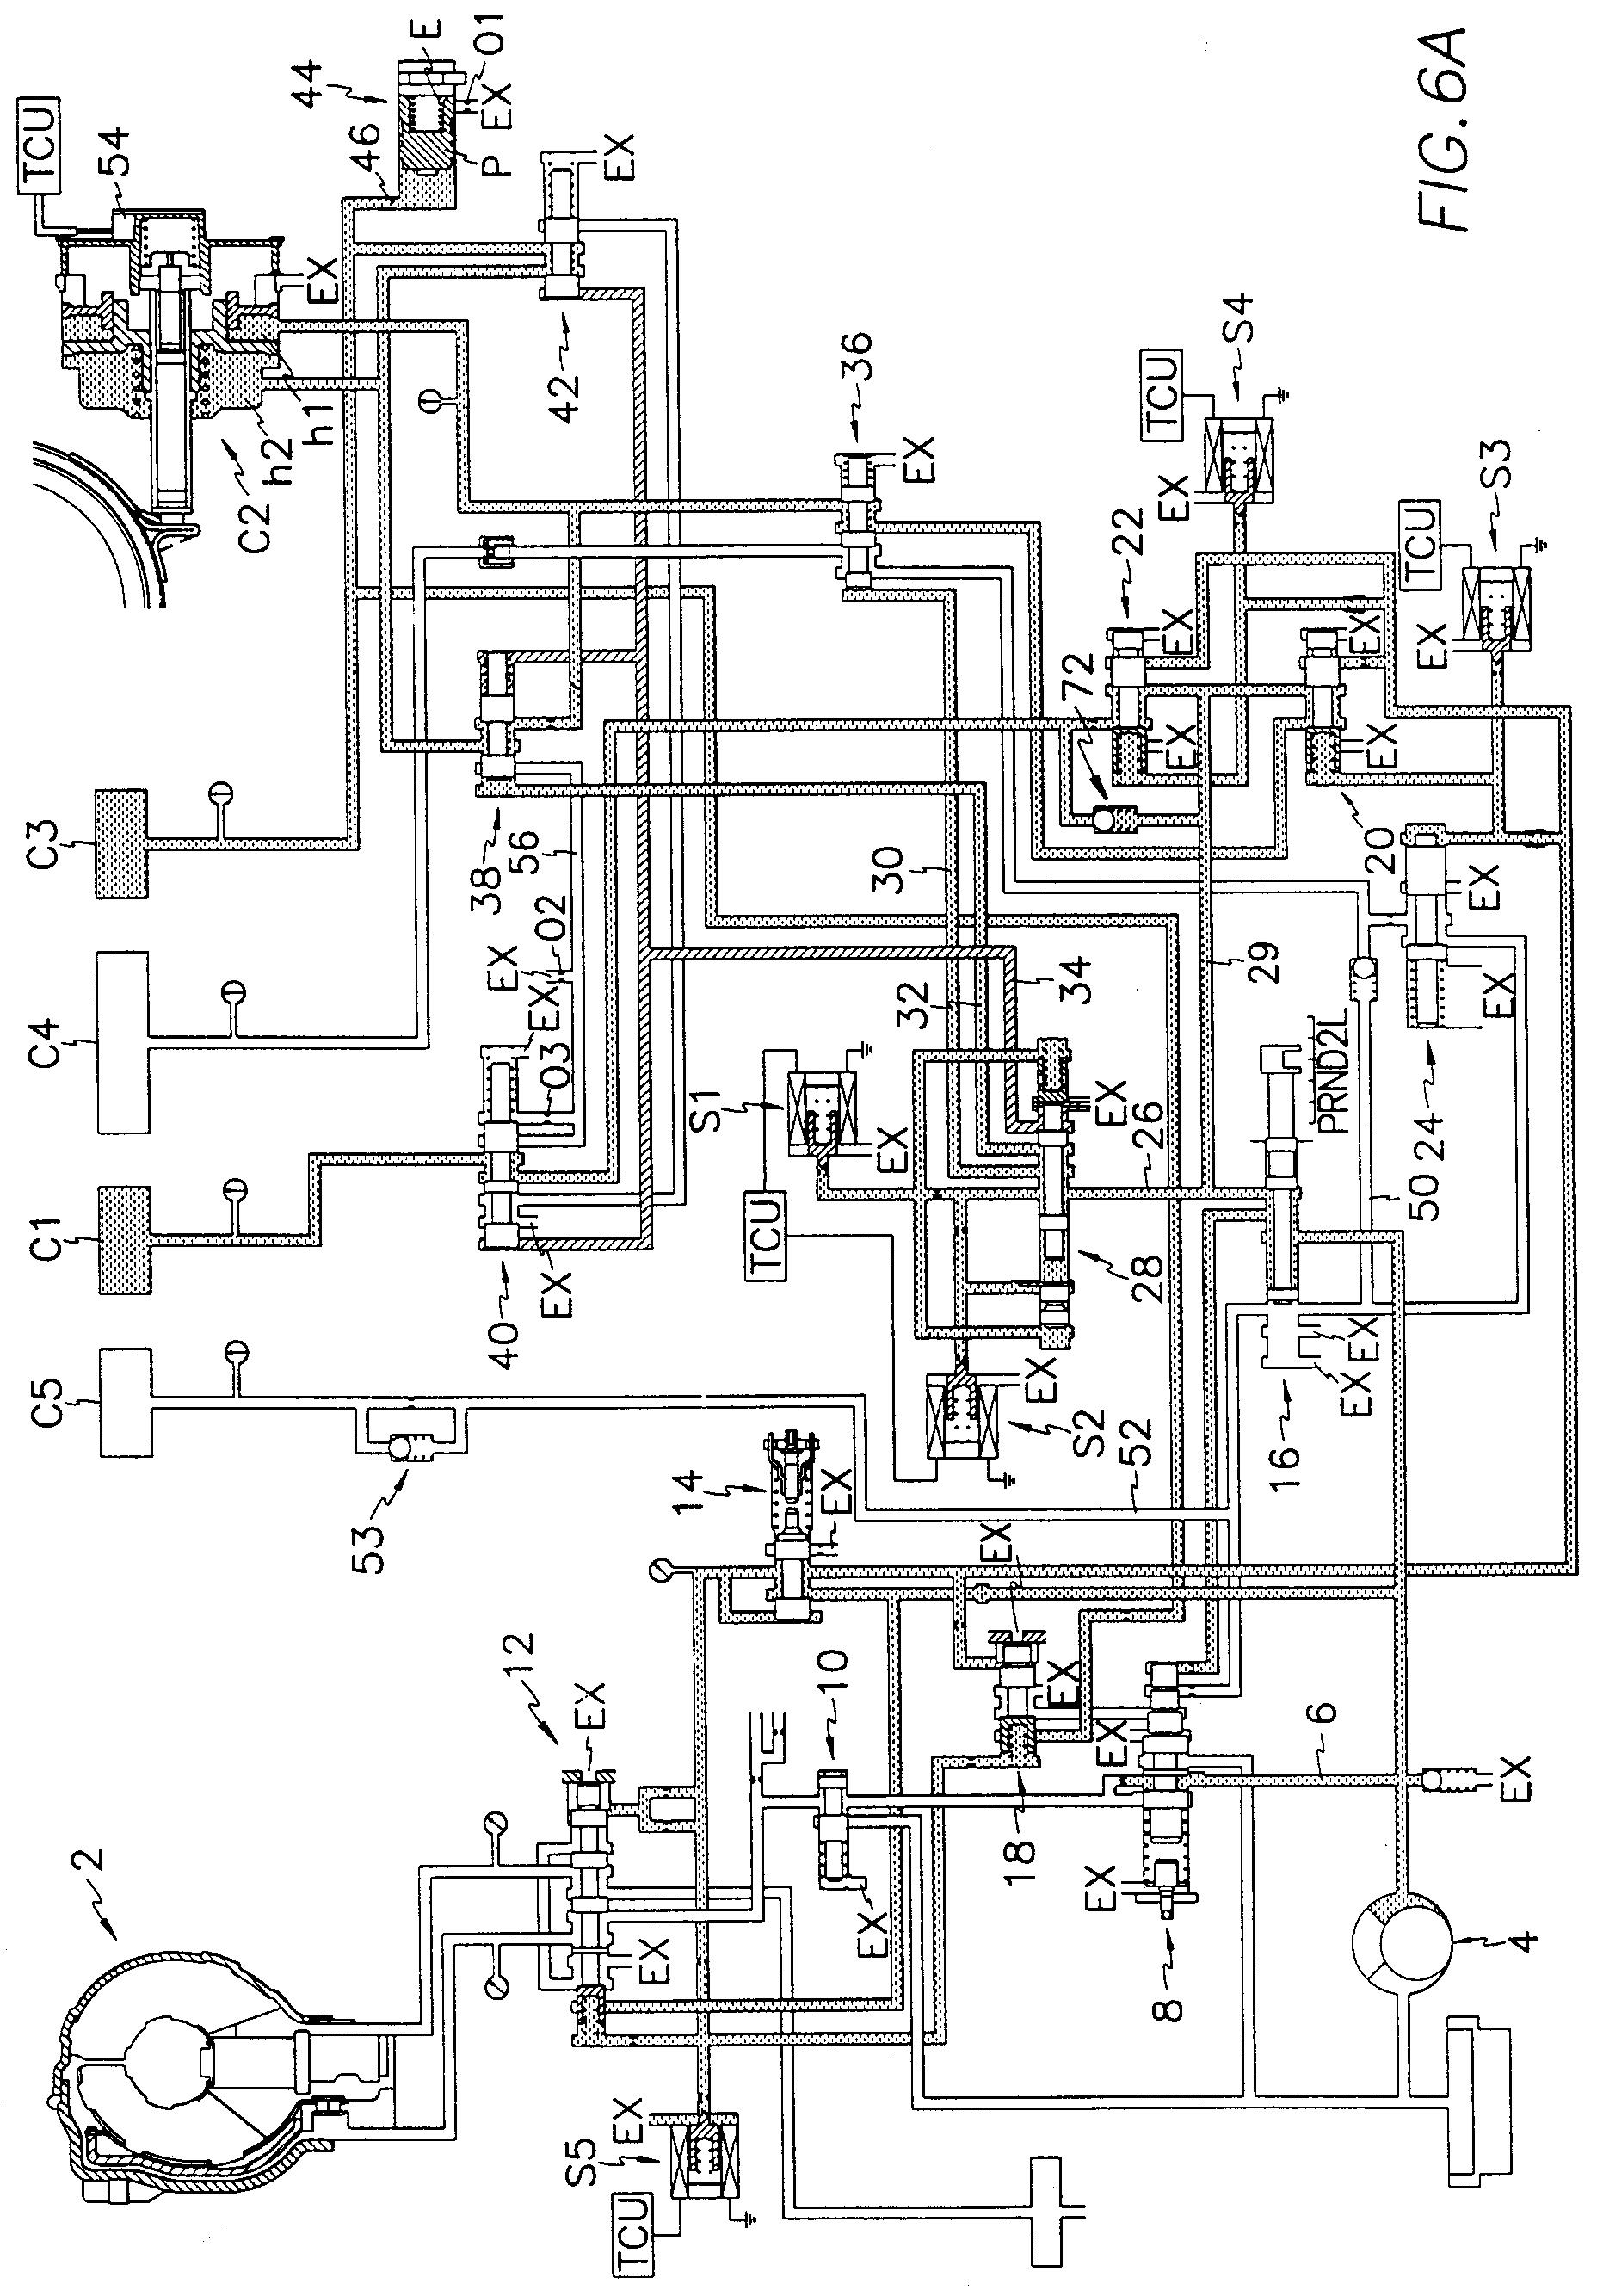 international s1900 wiring diagram ~ wiring diagram portal ~ \u2022 1984 international s1900 wiring diagram international s1900 wiring diagram